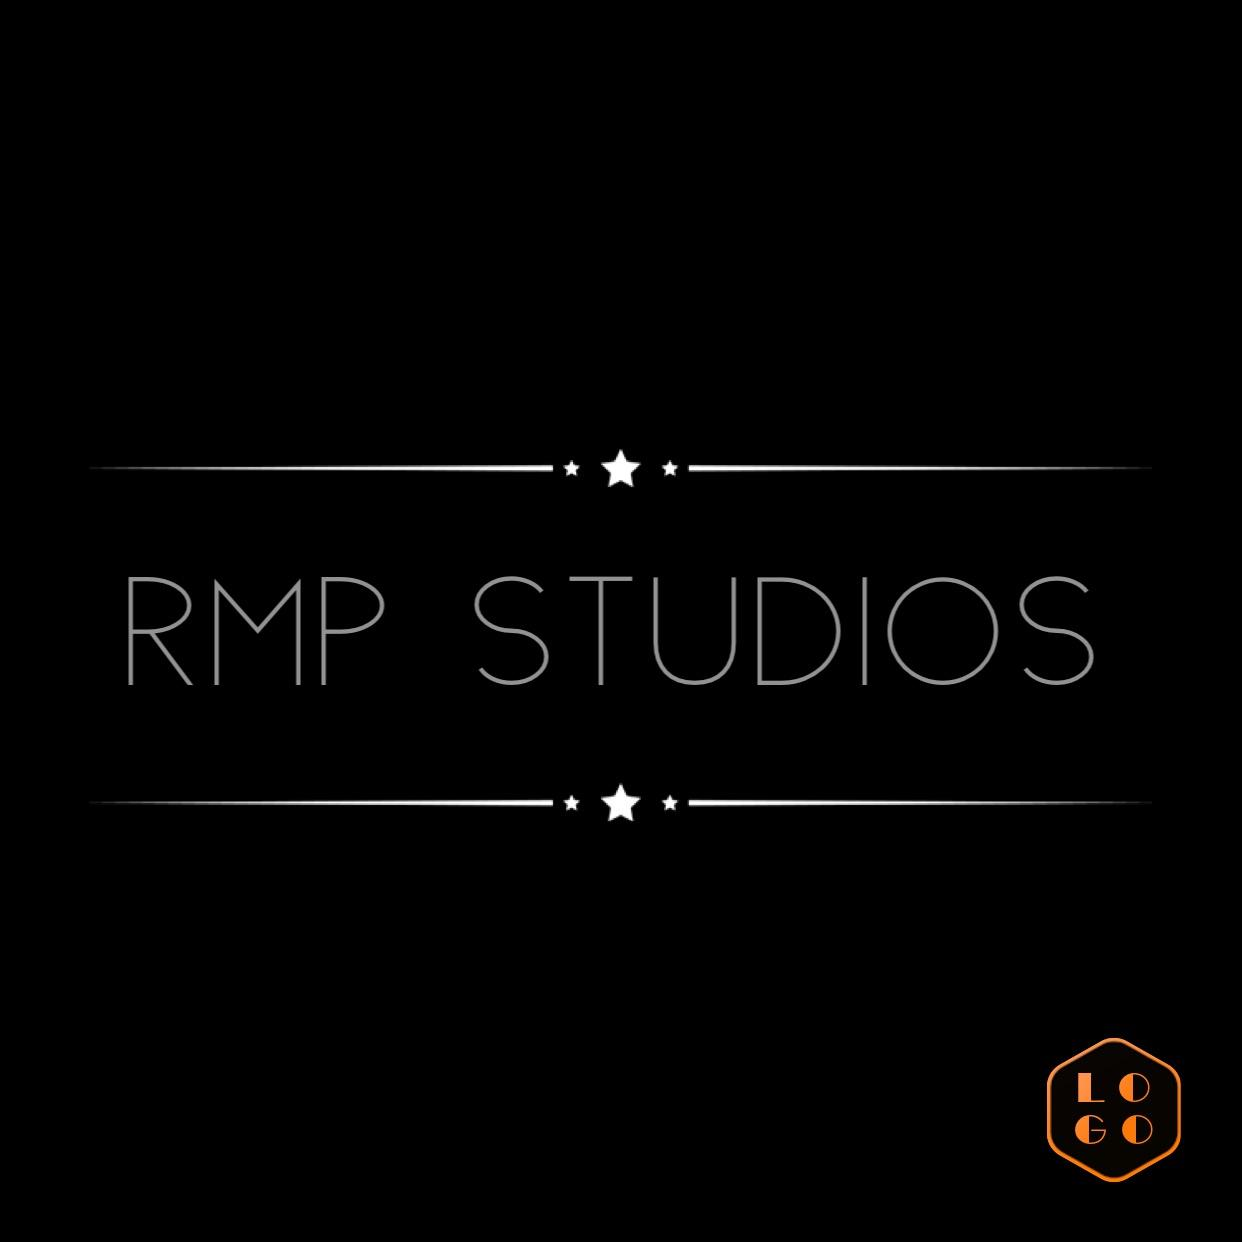 RMP studios